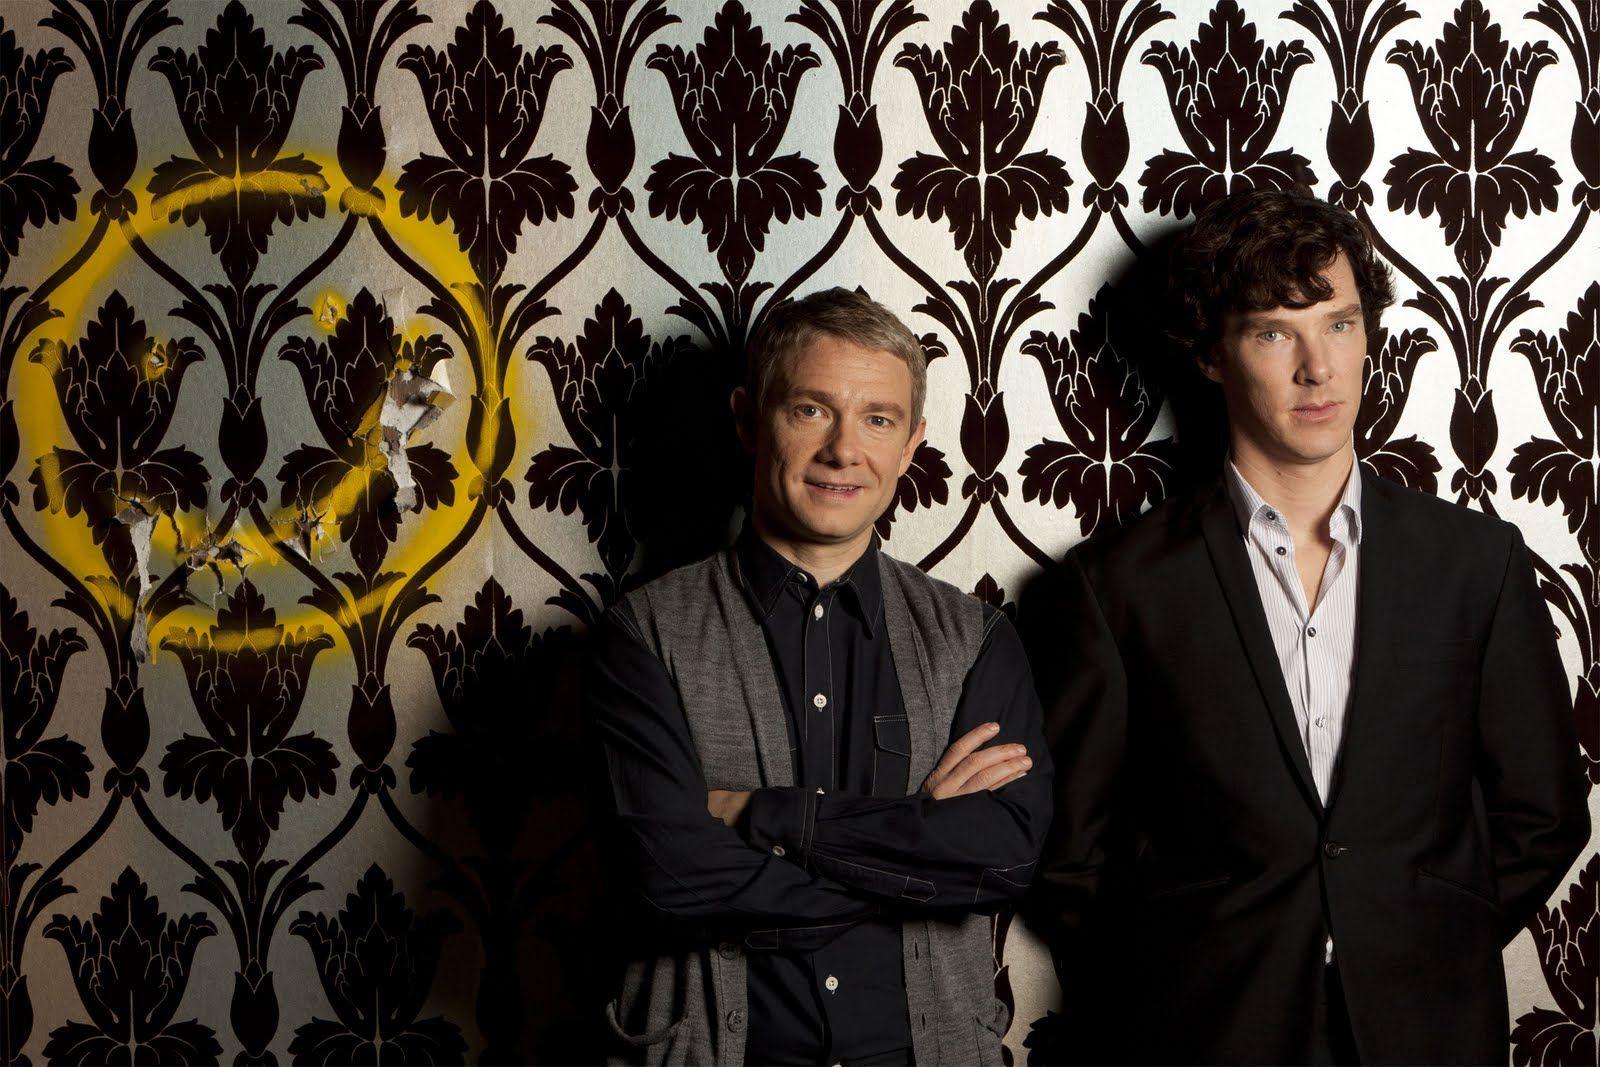 BBC Sherlock Wallpaper | Season 2 Photos - Sherlock on BBC One Photo (27848374) - Fanpop .